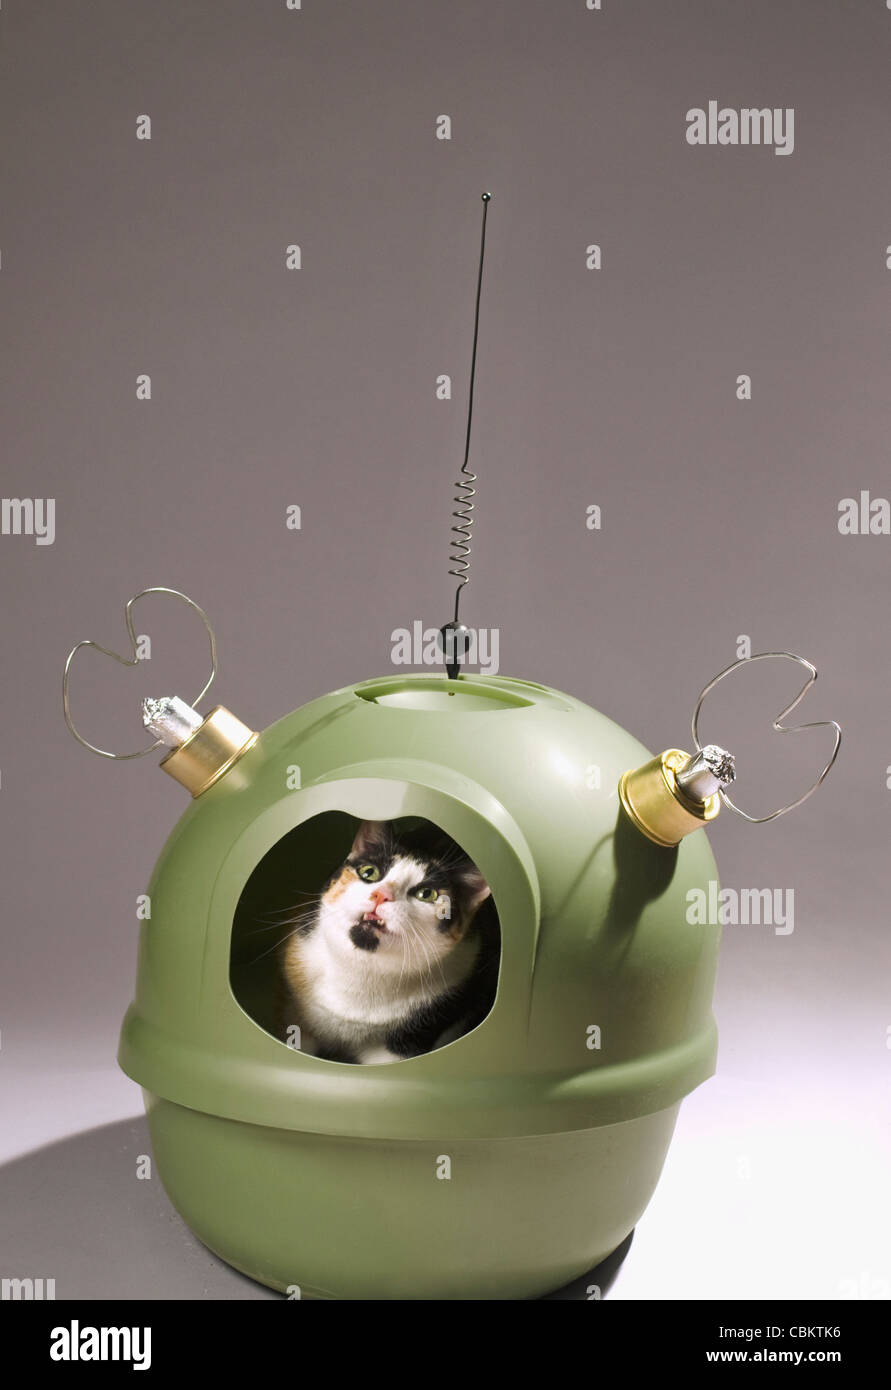 Katze starrte aus Katzenklo mit Antennen befestigt Stockbild